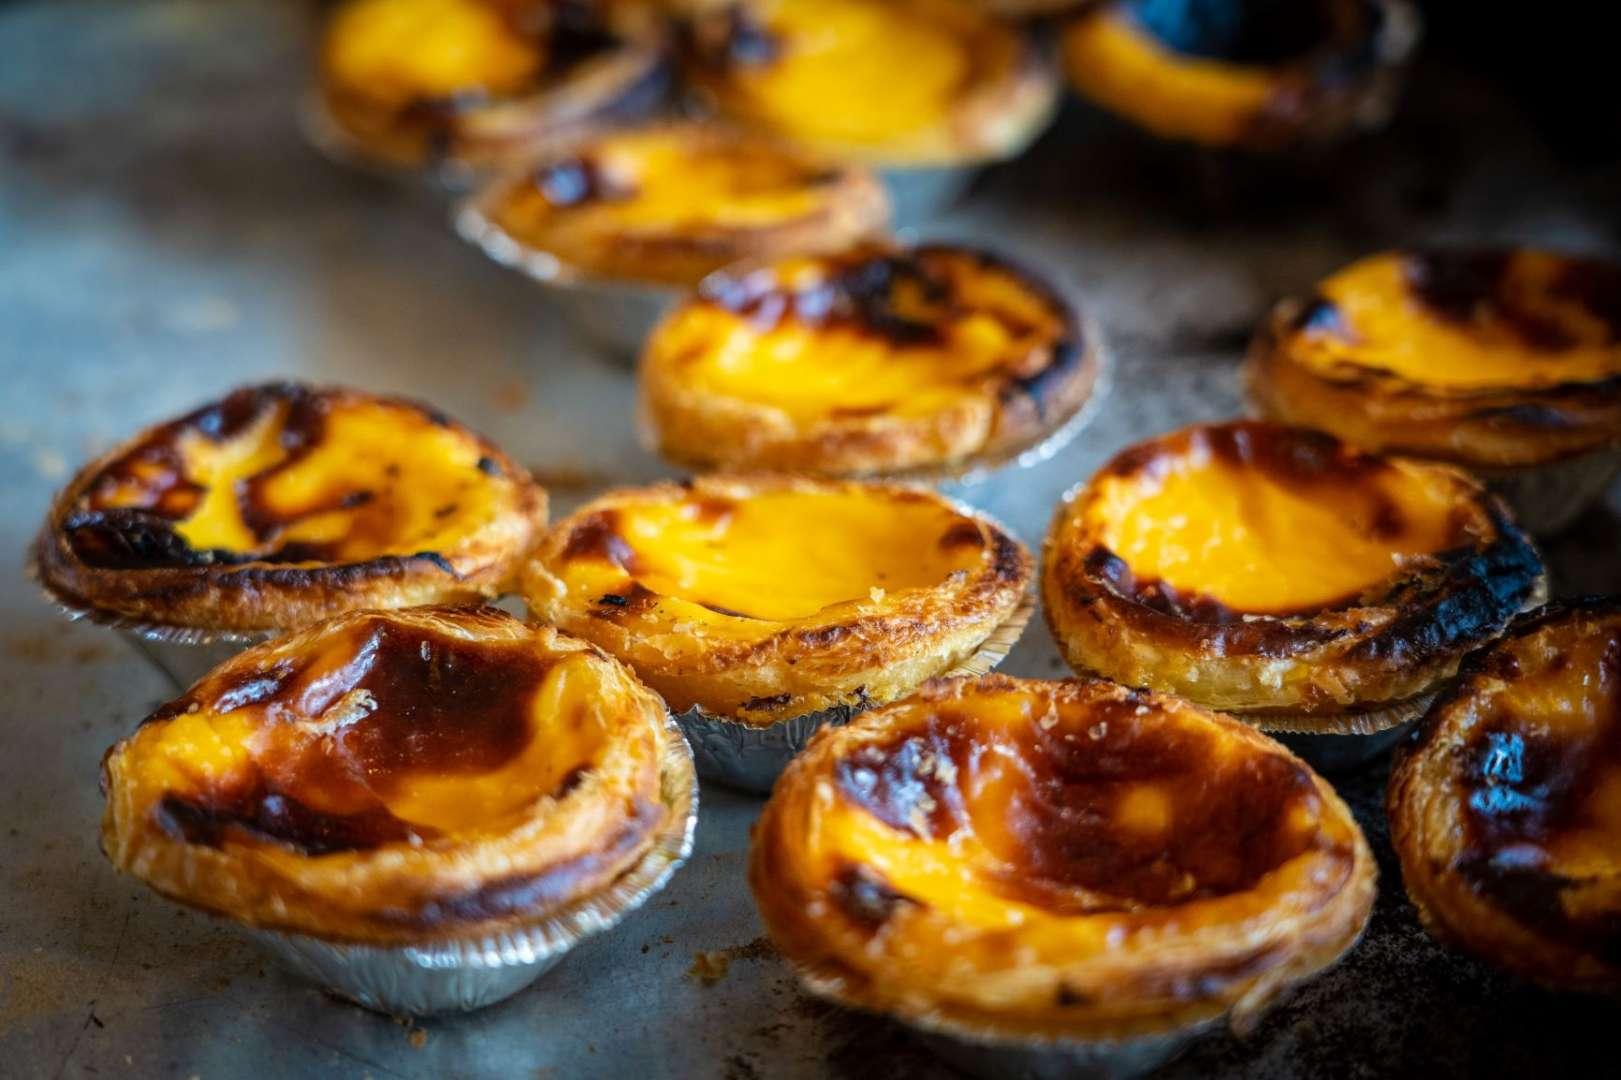 Reason to Visit Portugal - Pastel De Nata